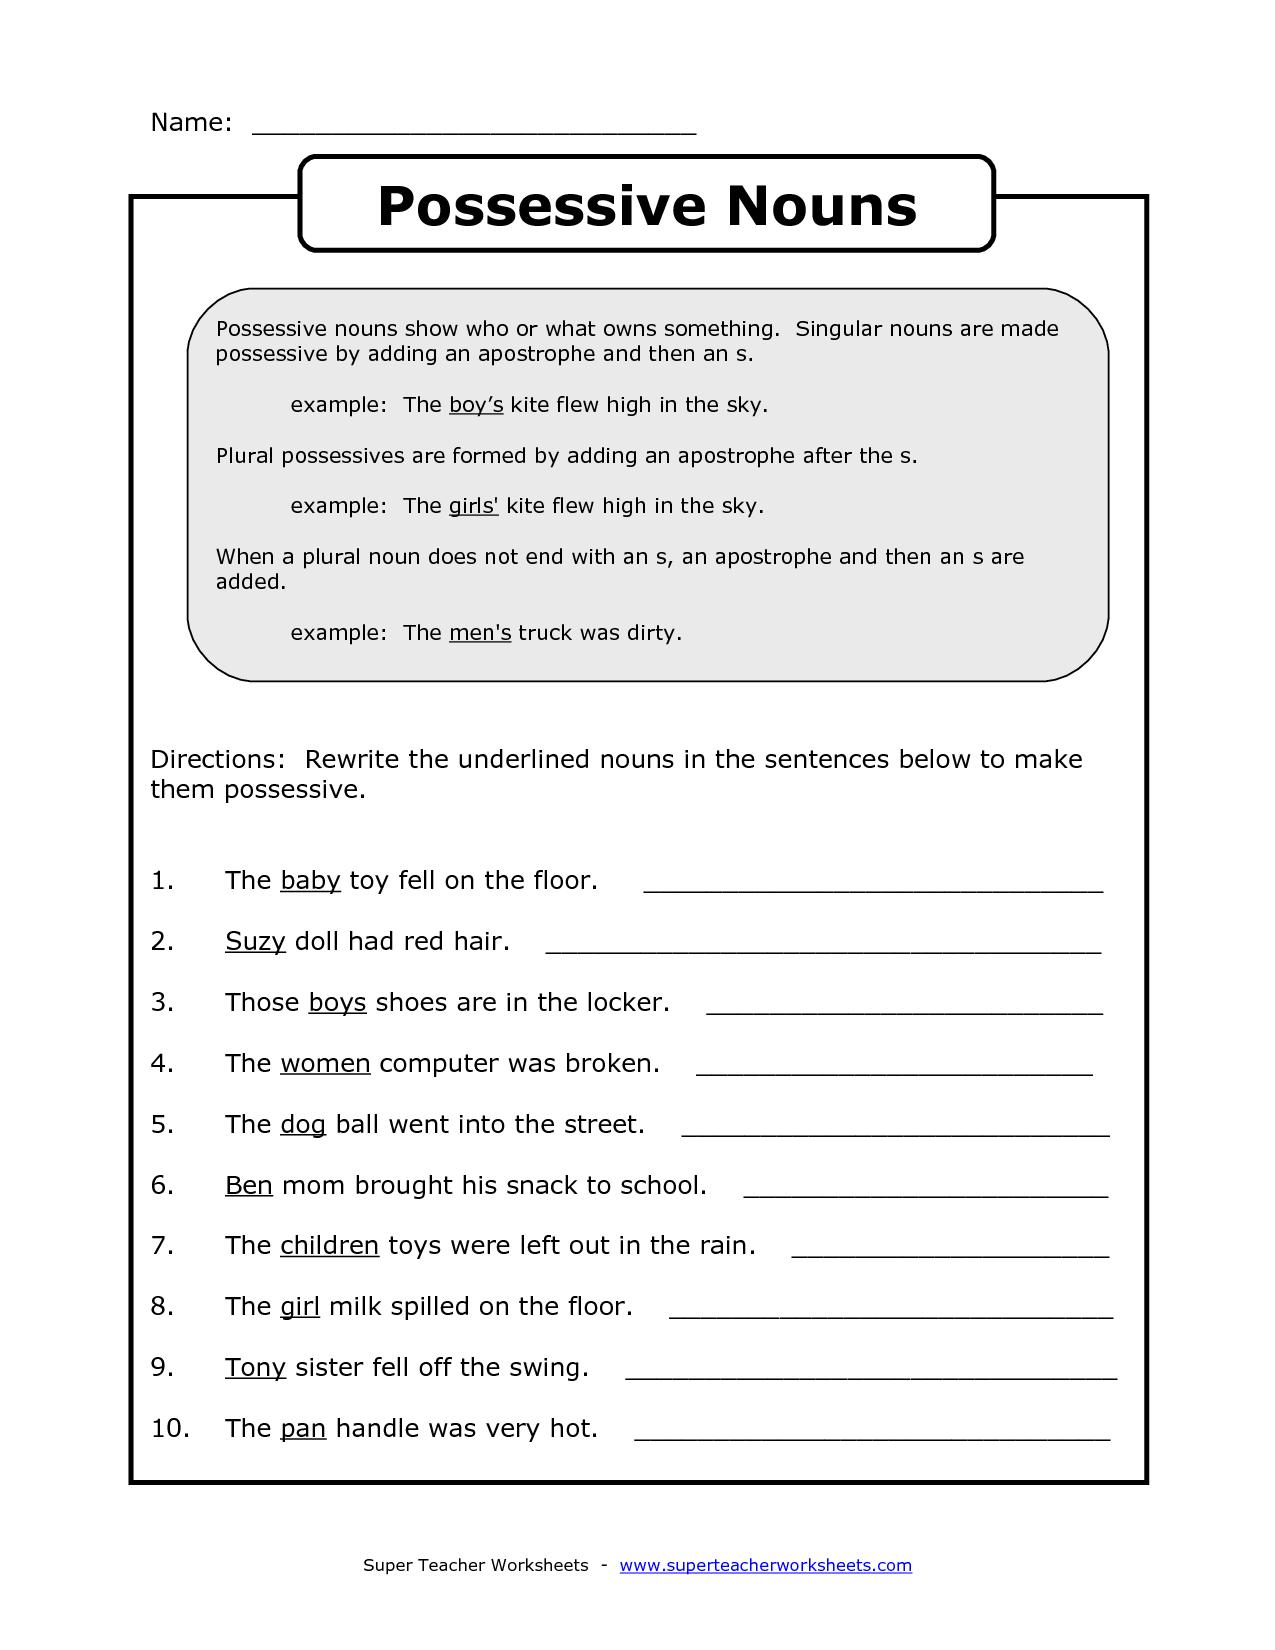 18 Best Images Of Possessive Nouns Printable Worksheets